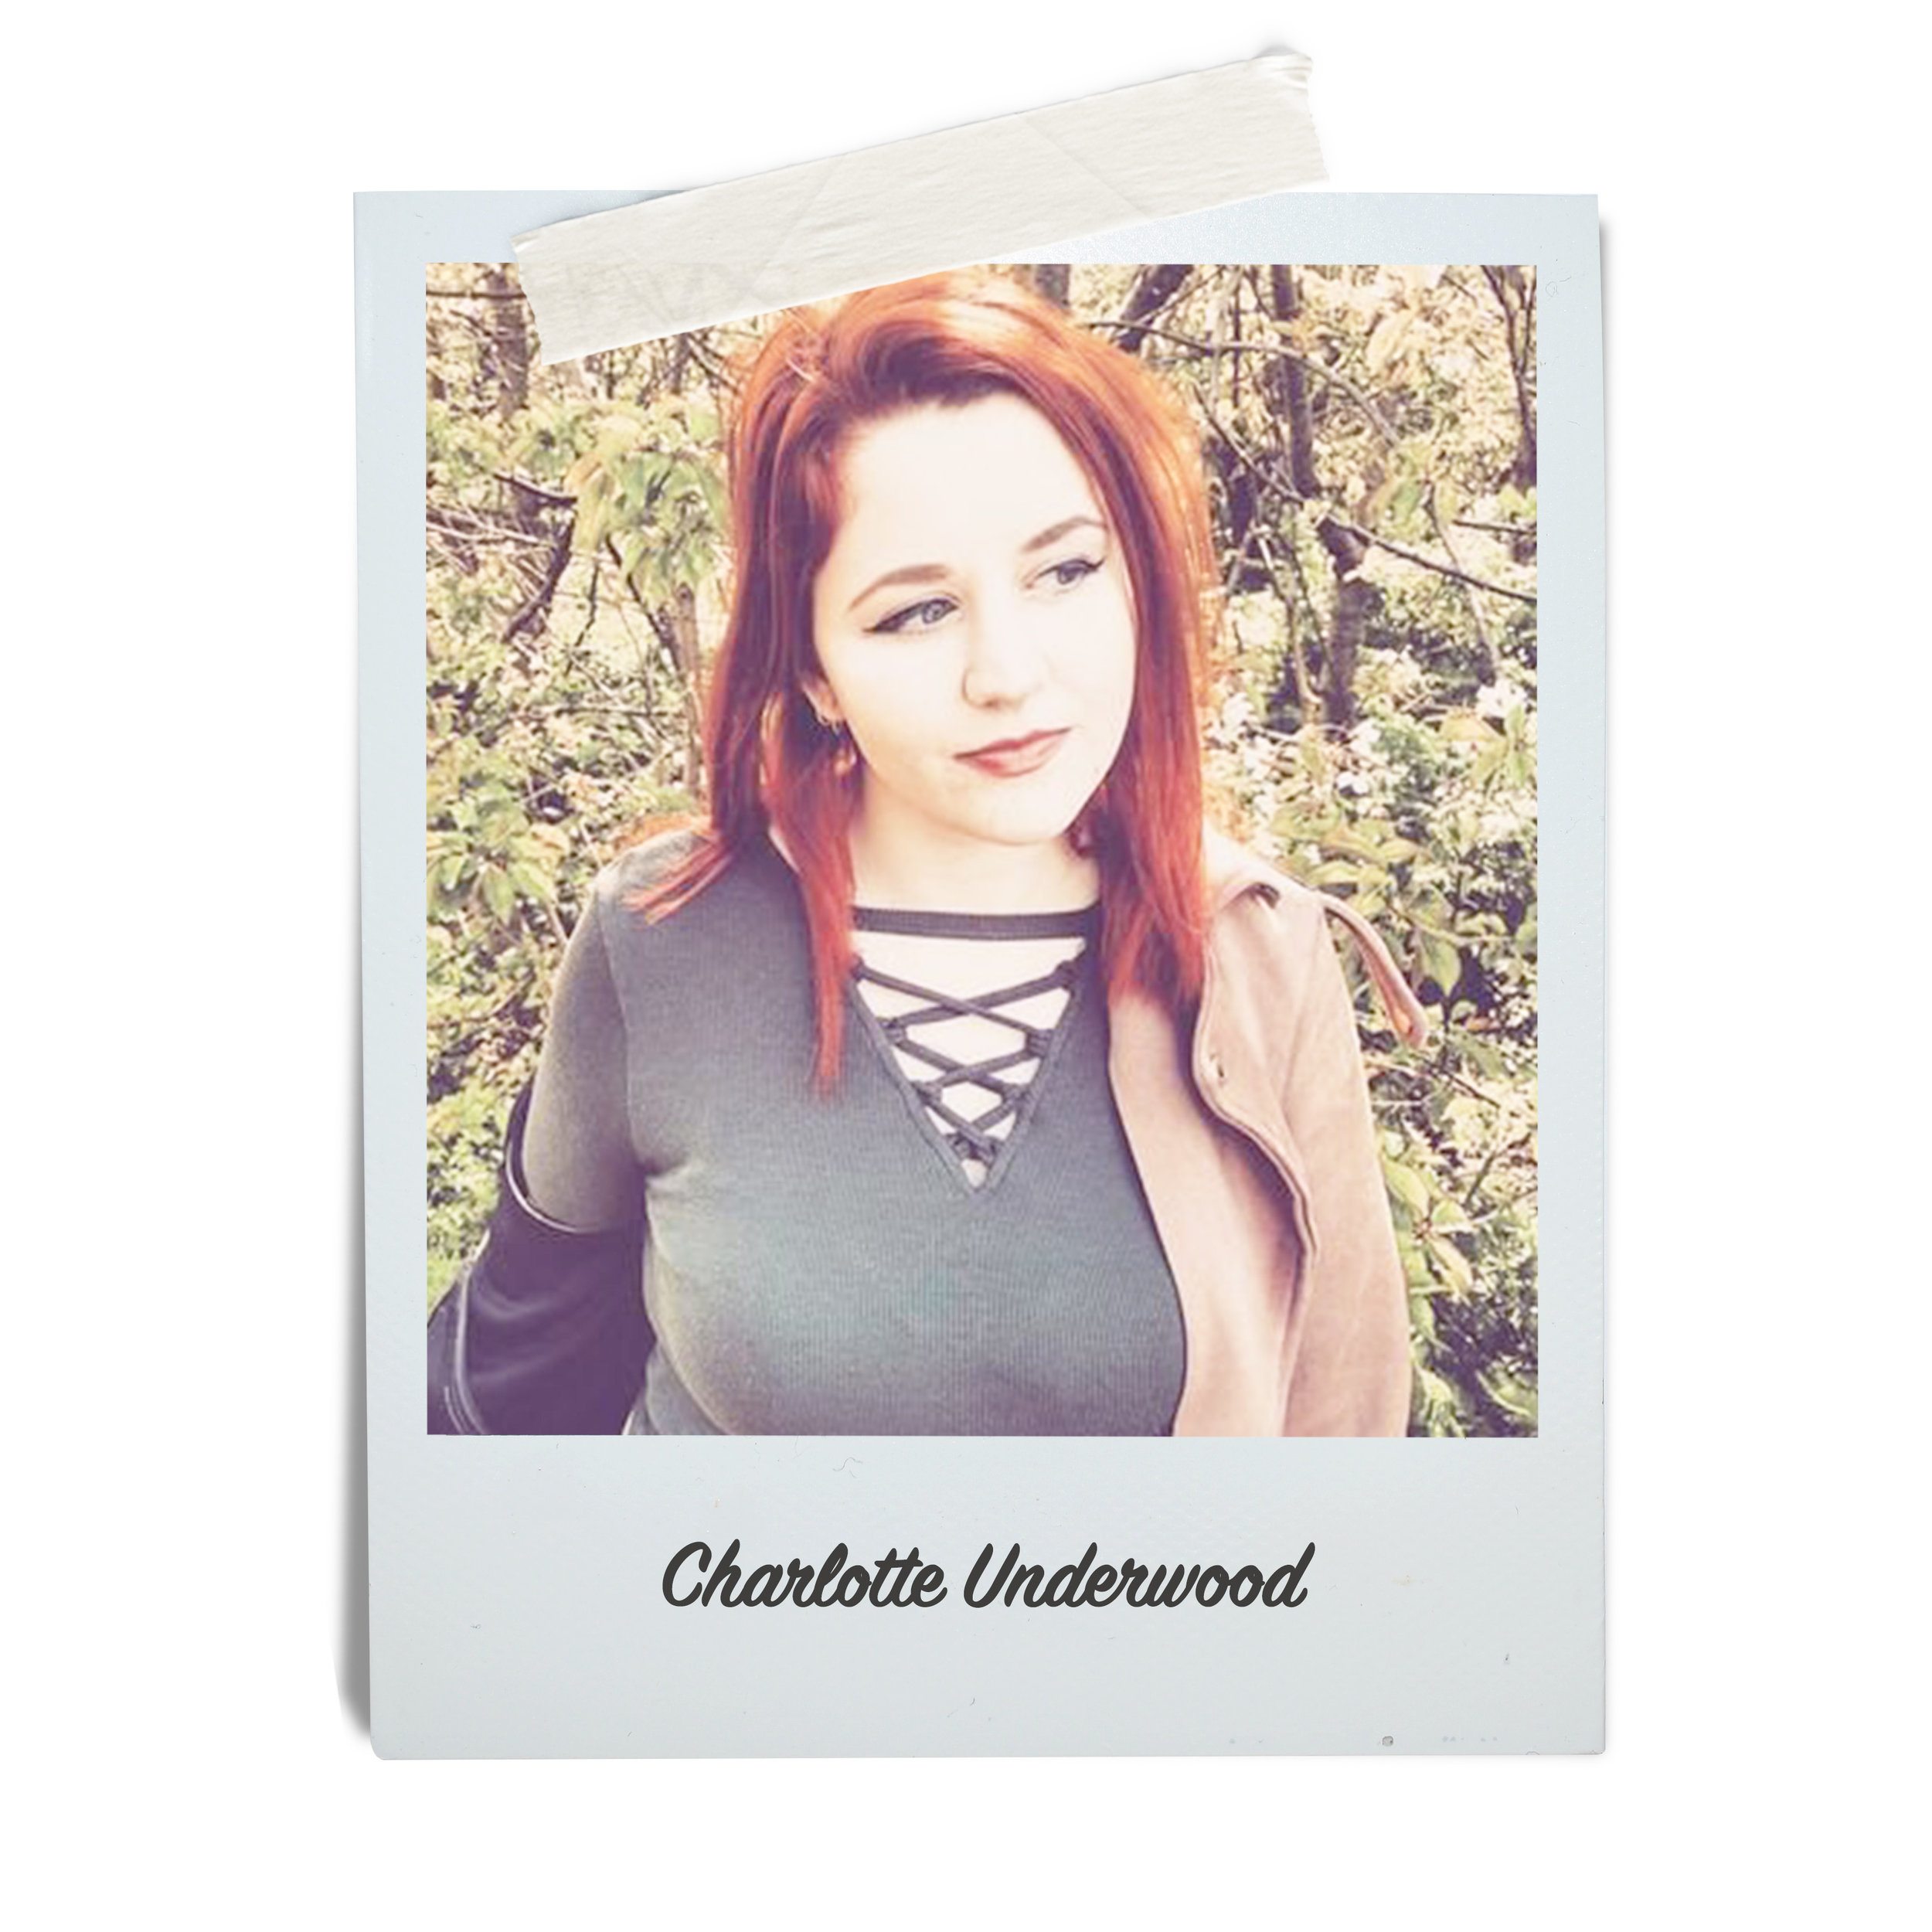 Charlotte Underwood